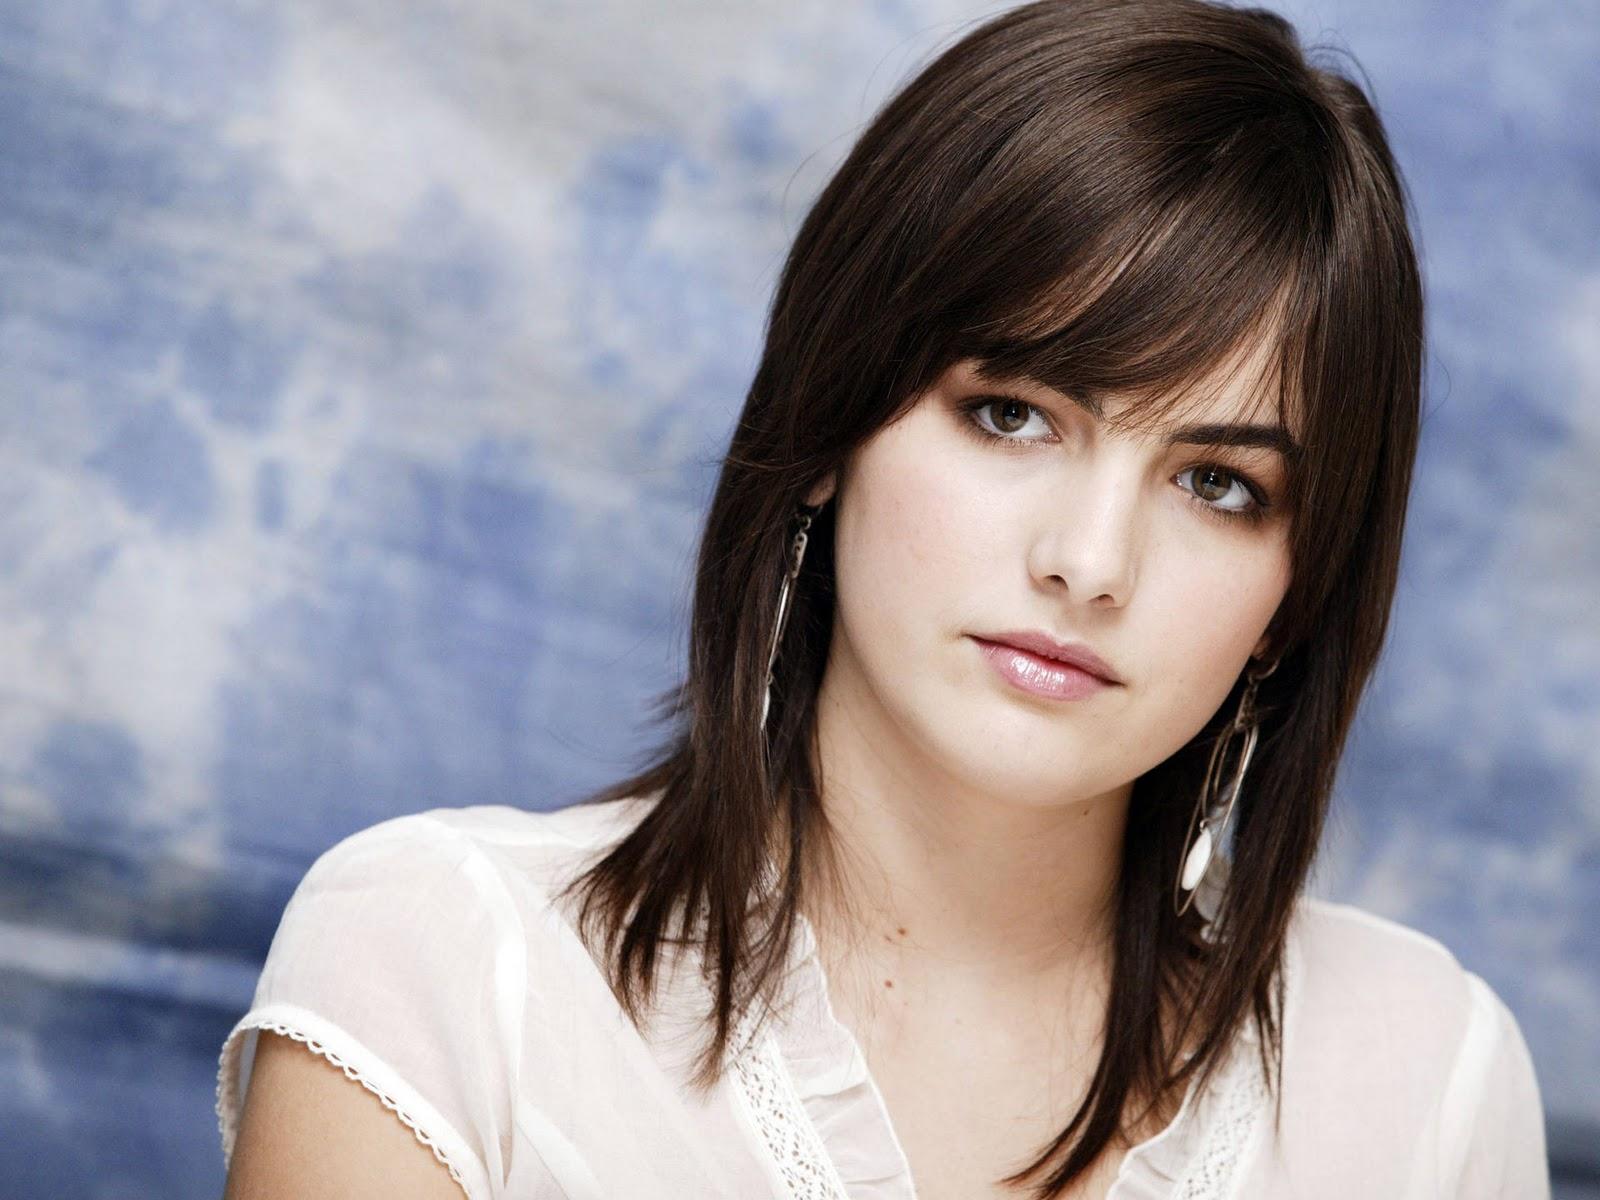 hollywood wallpedia: hollywood actress images